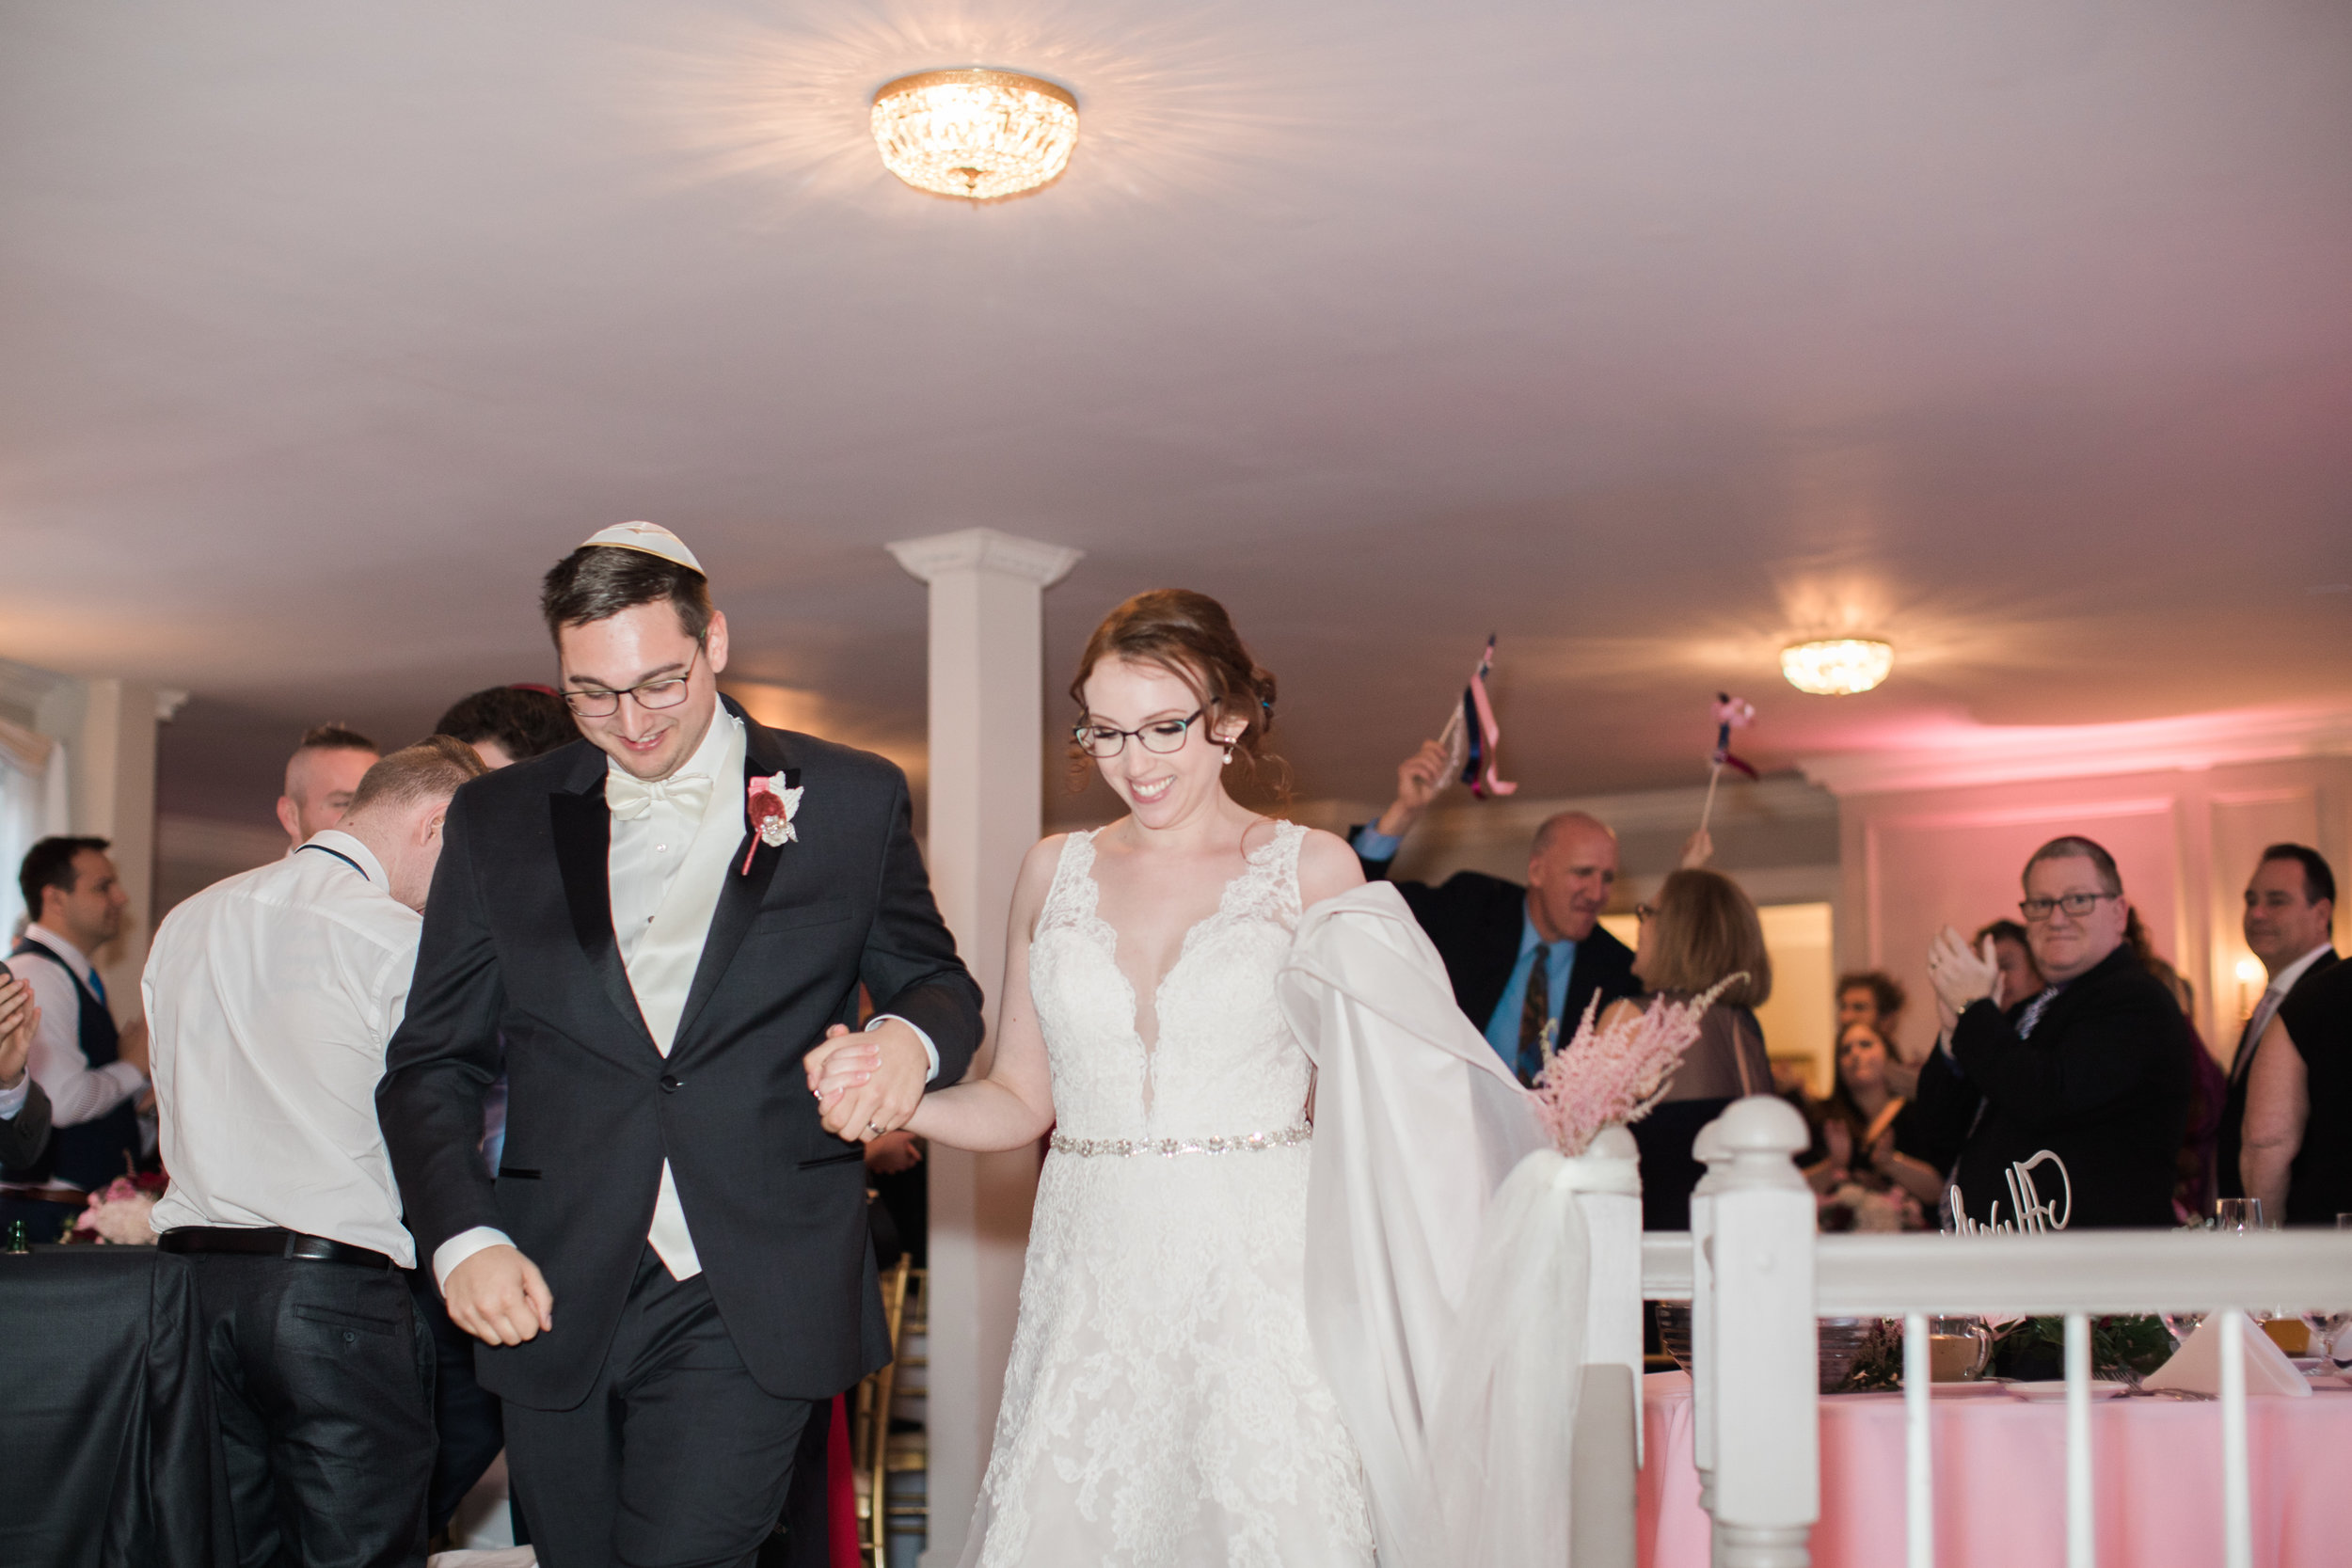 Harry Potter Wedding at Overhills Mansion Catonville Maryland Wedding Photographers Megapixels Media (95 of 134).jpg